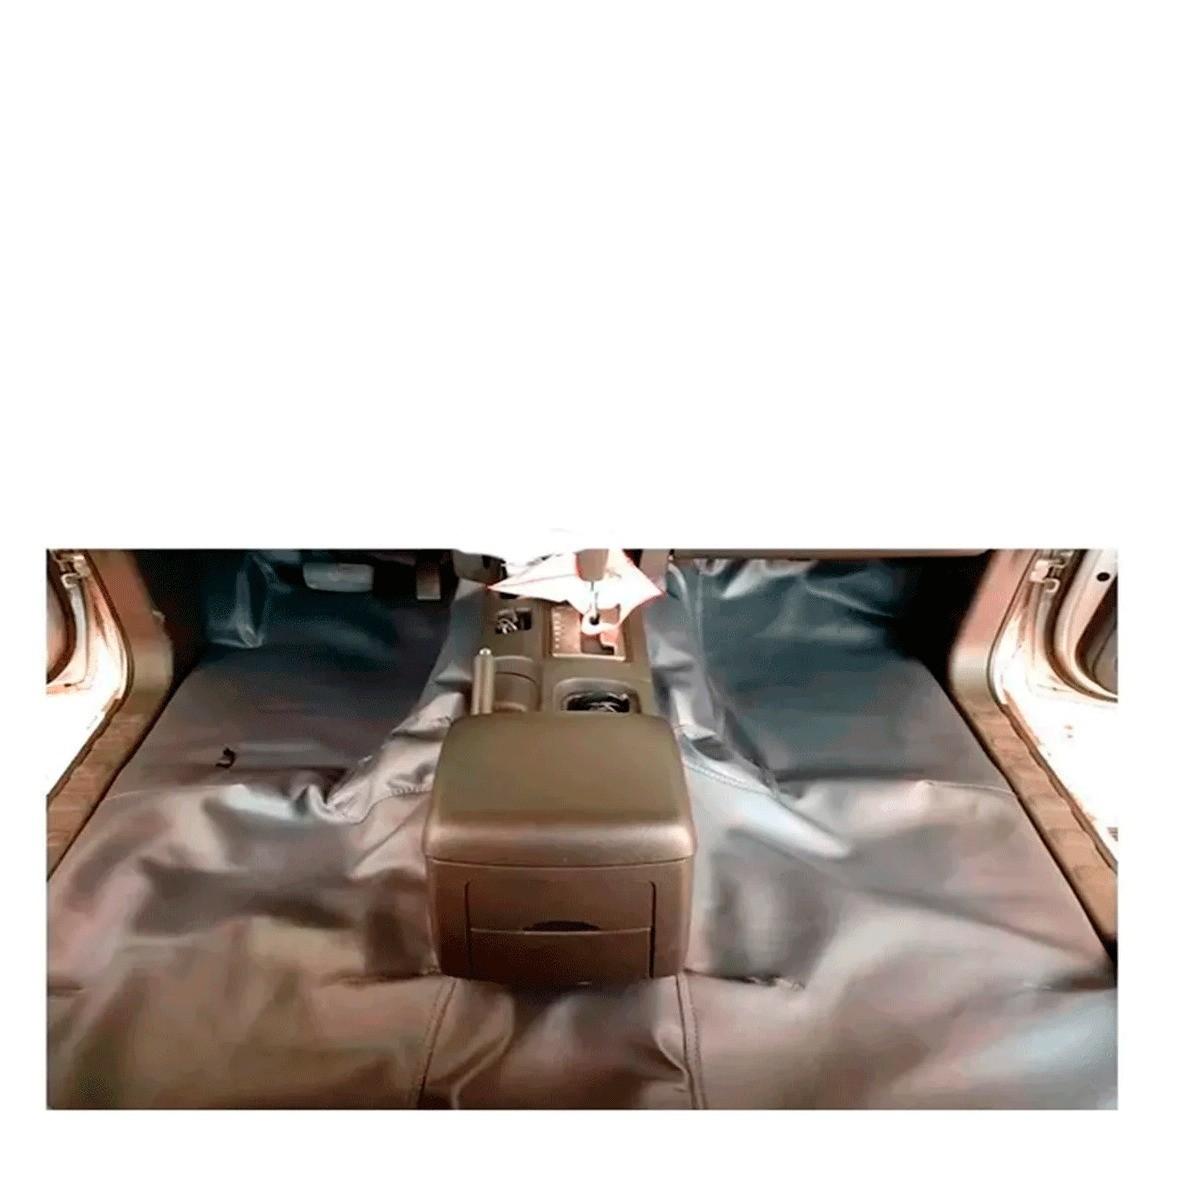 Tapete Automotivo Assoalho Emborrachado Bidim Ford Verona